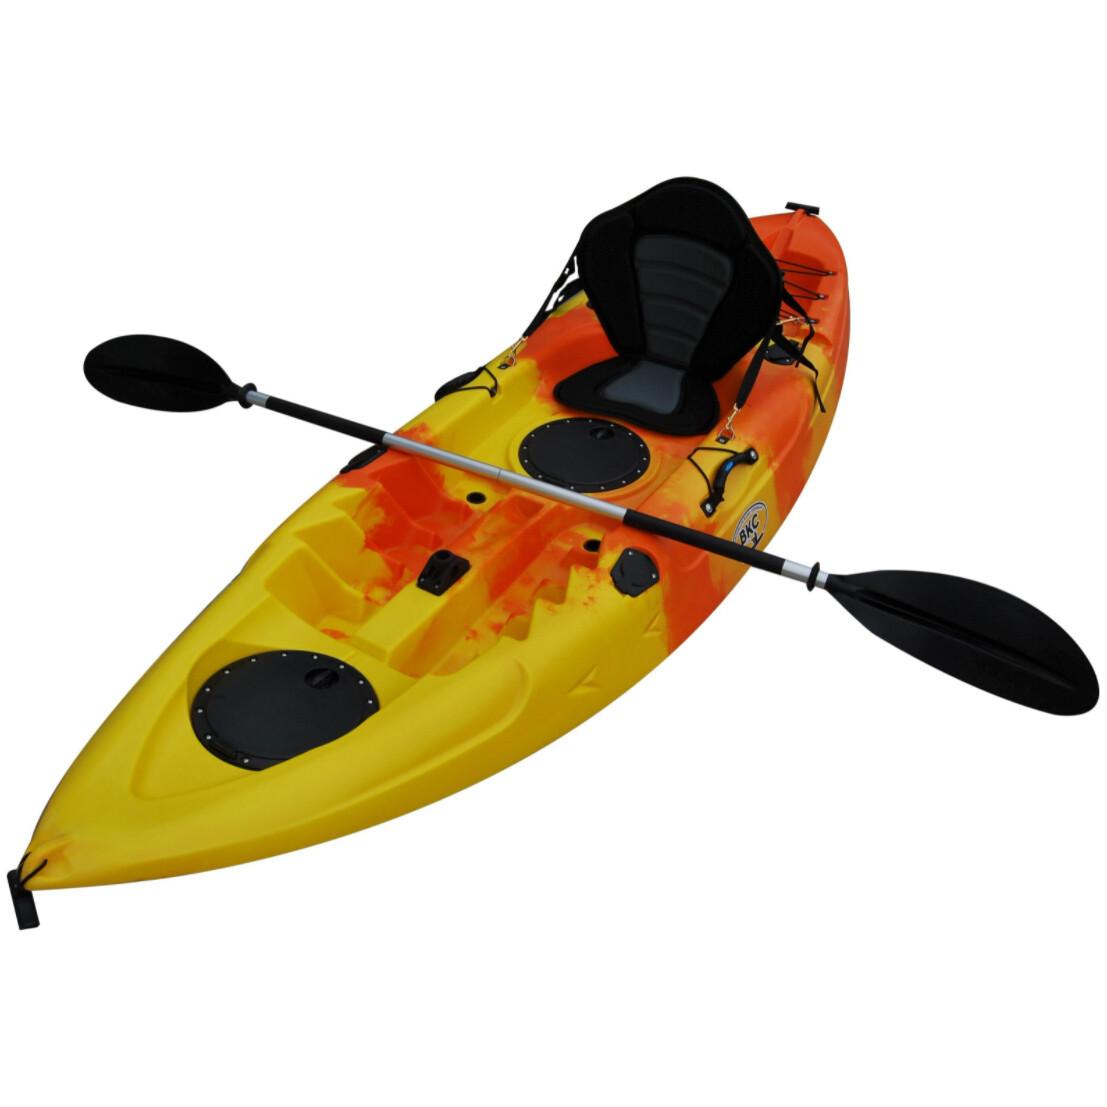 A Brooklyn single kayak rental at Lago Mar in Houston, Texas, specifically Texas City, Texas.